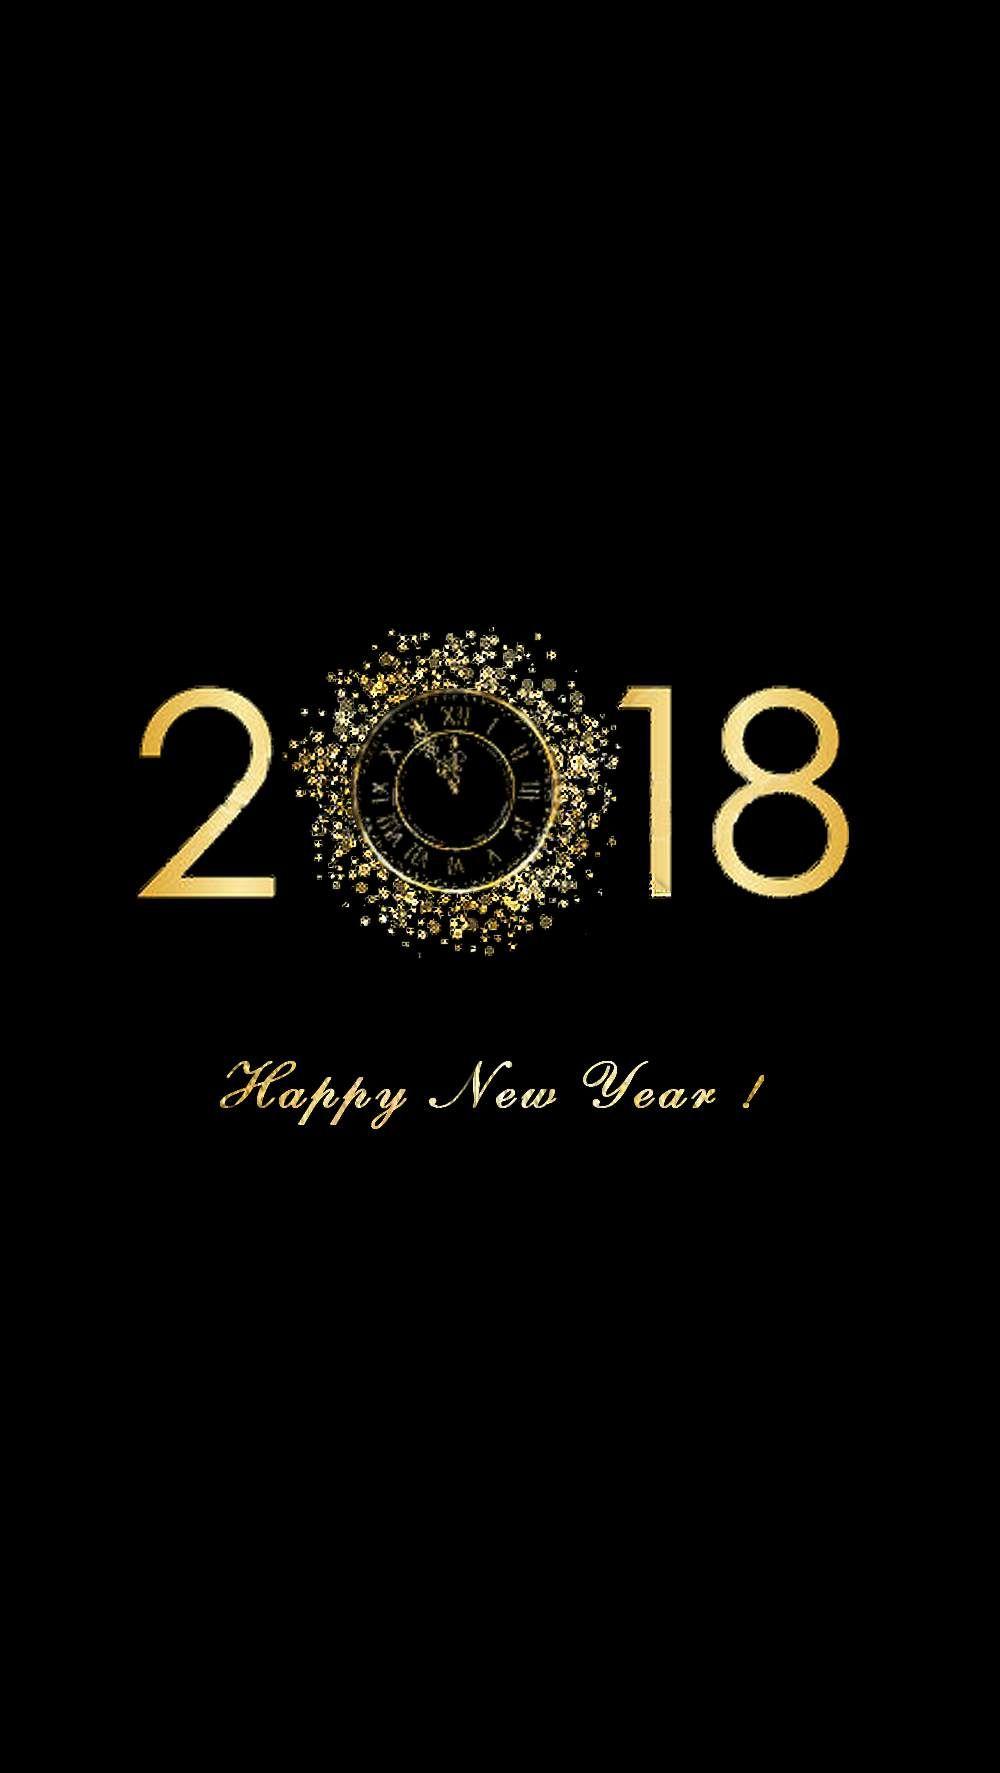 Ma création pour 2018 | Feliz Año Nuevo | Pinterest | Happy new year ...